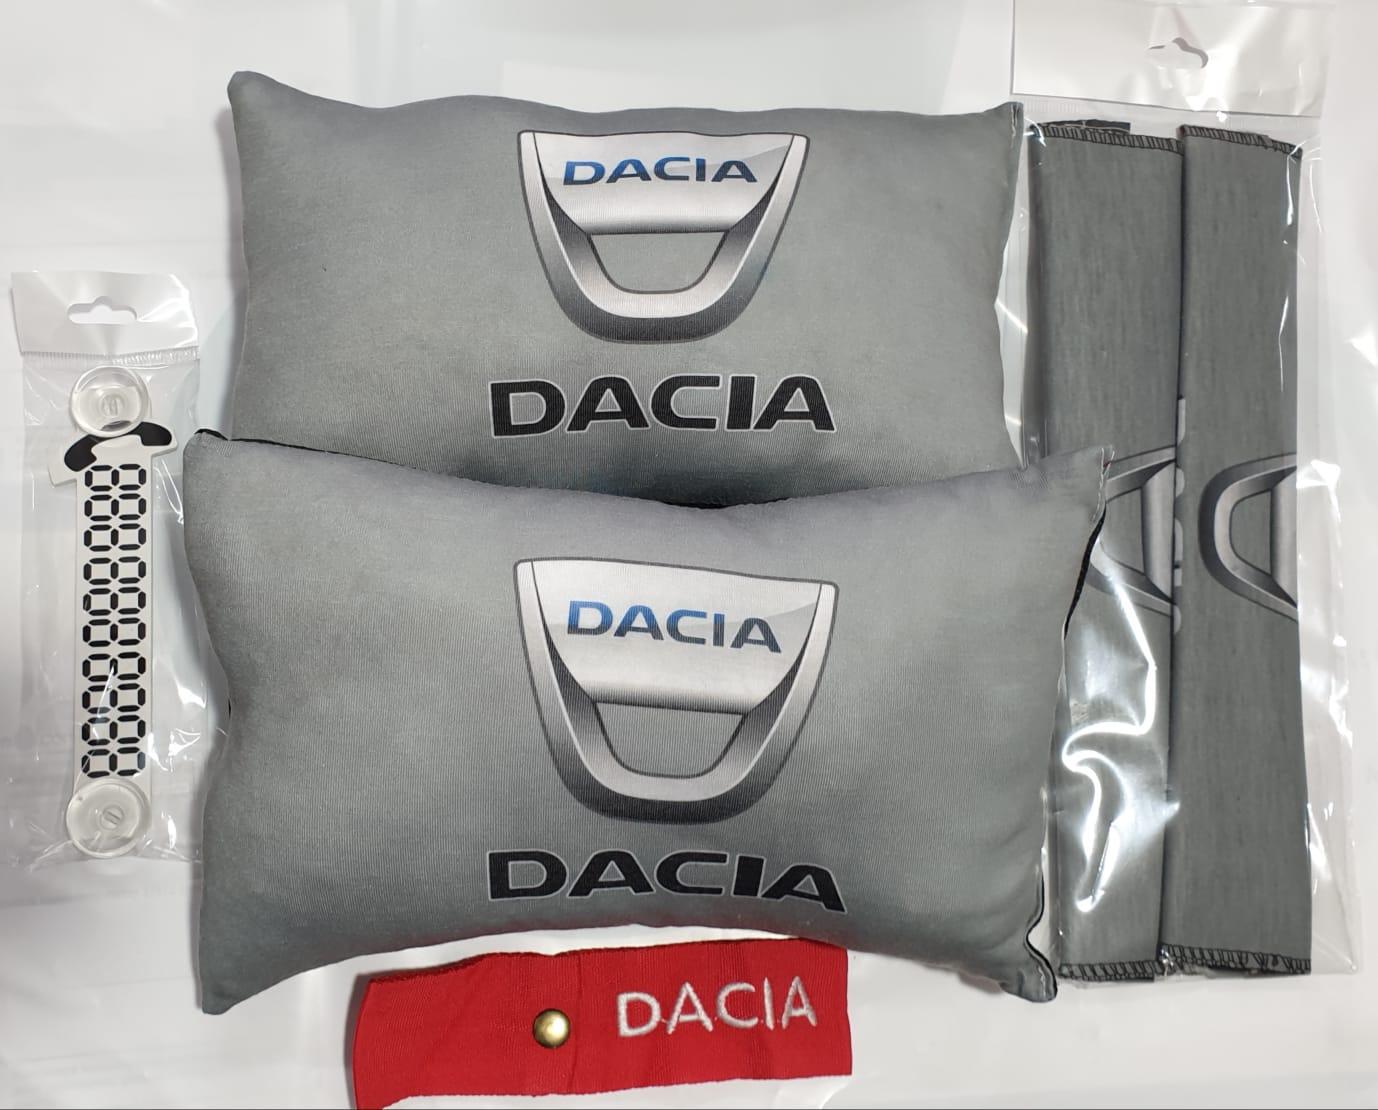 Dacia 2 BOYUN YASTIK 2 KEMER KILIF tampon süsü ve numaramatik parktel elyaf dolgulu konfor minder